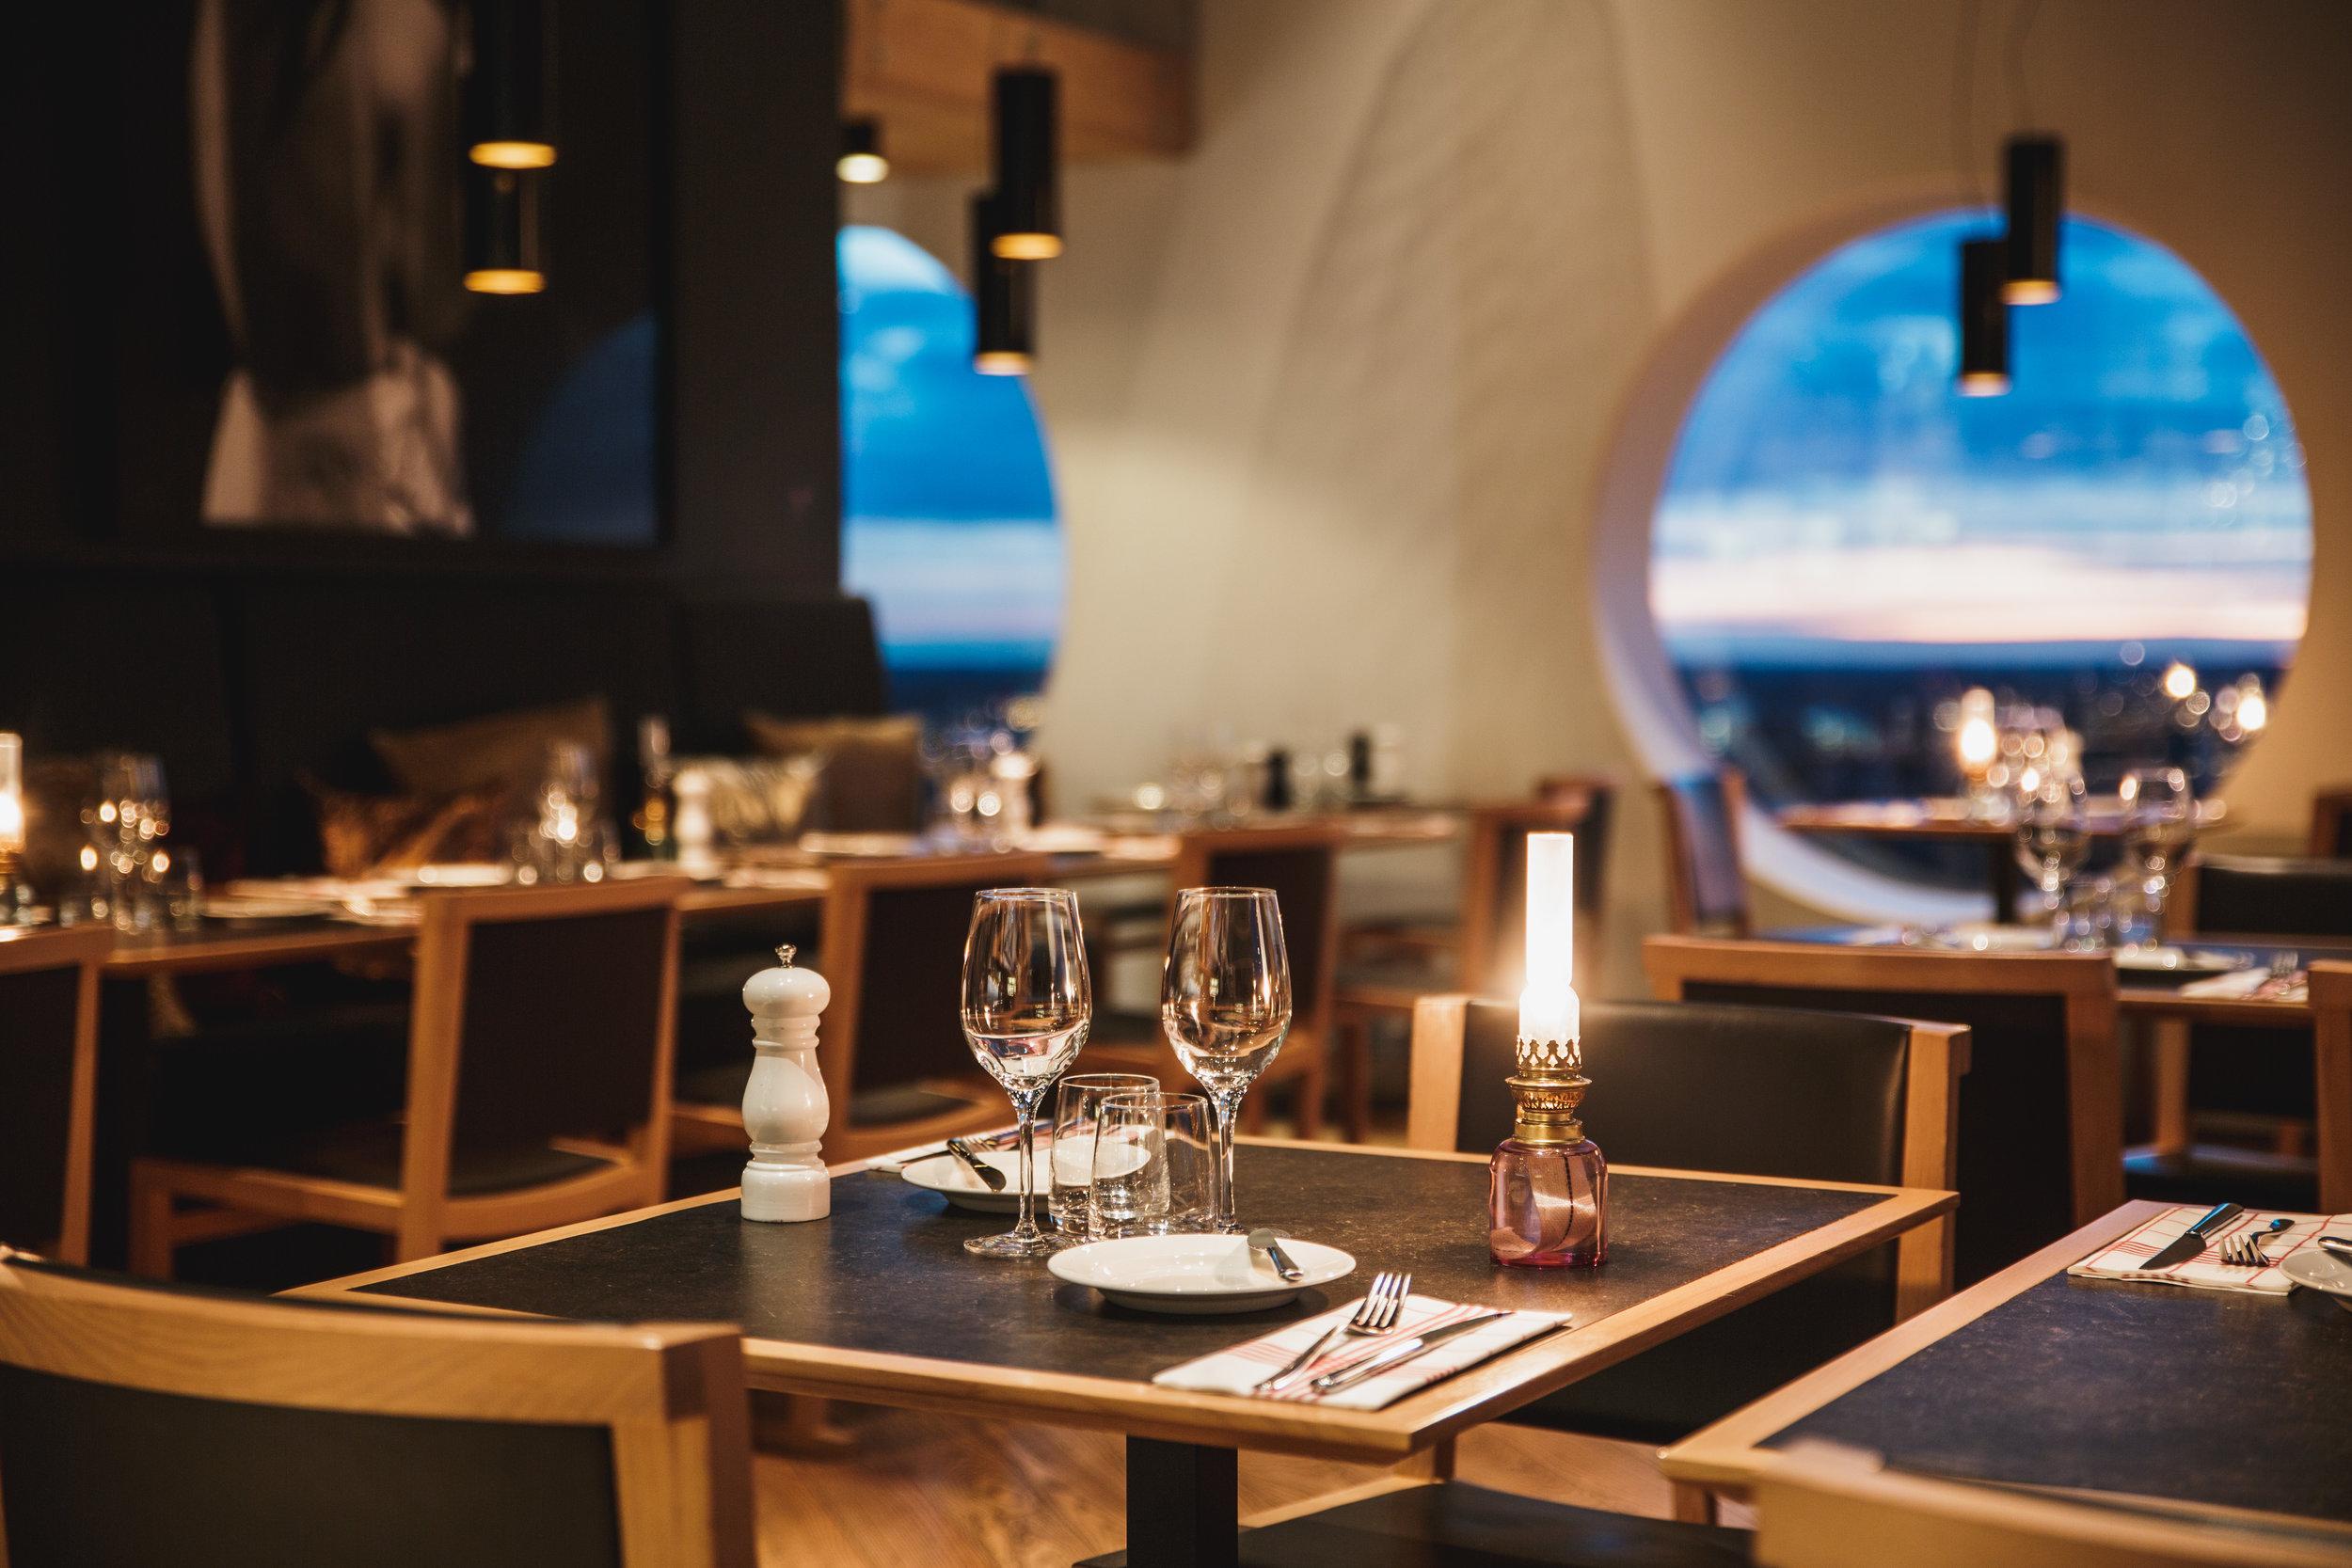 Quality-Hotel-Friends-BrasserieX-table.jpg